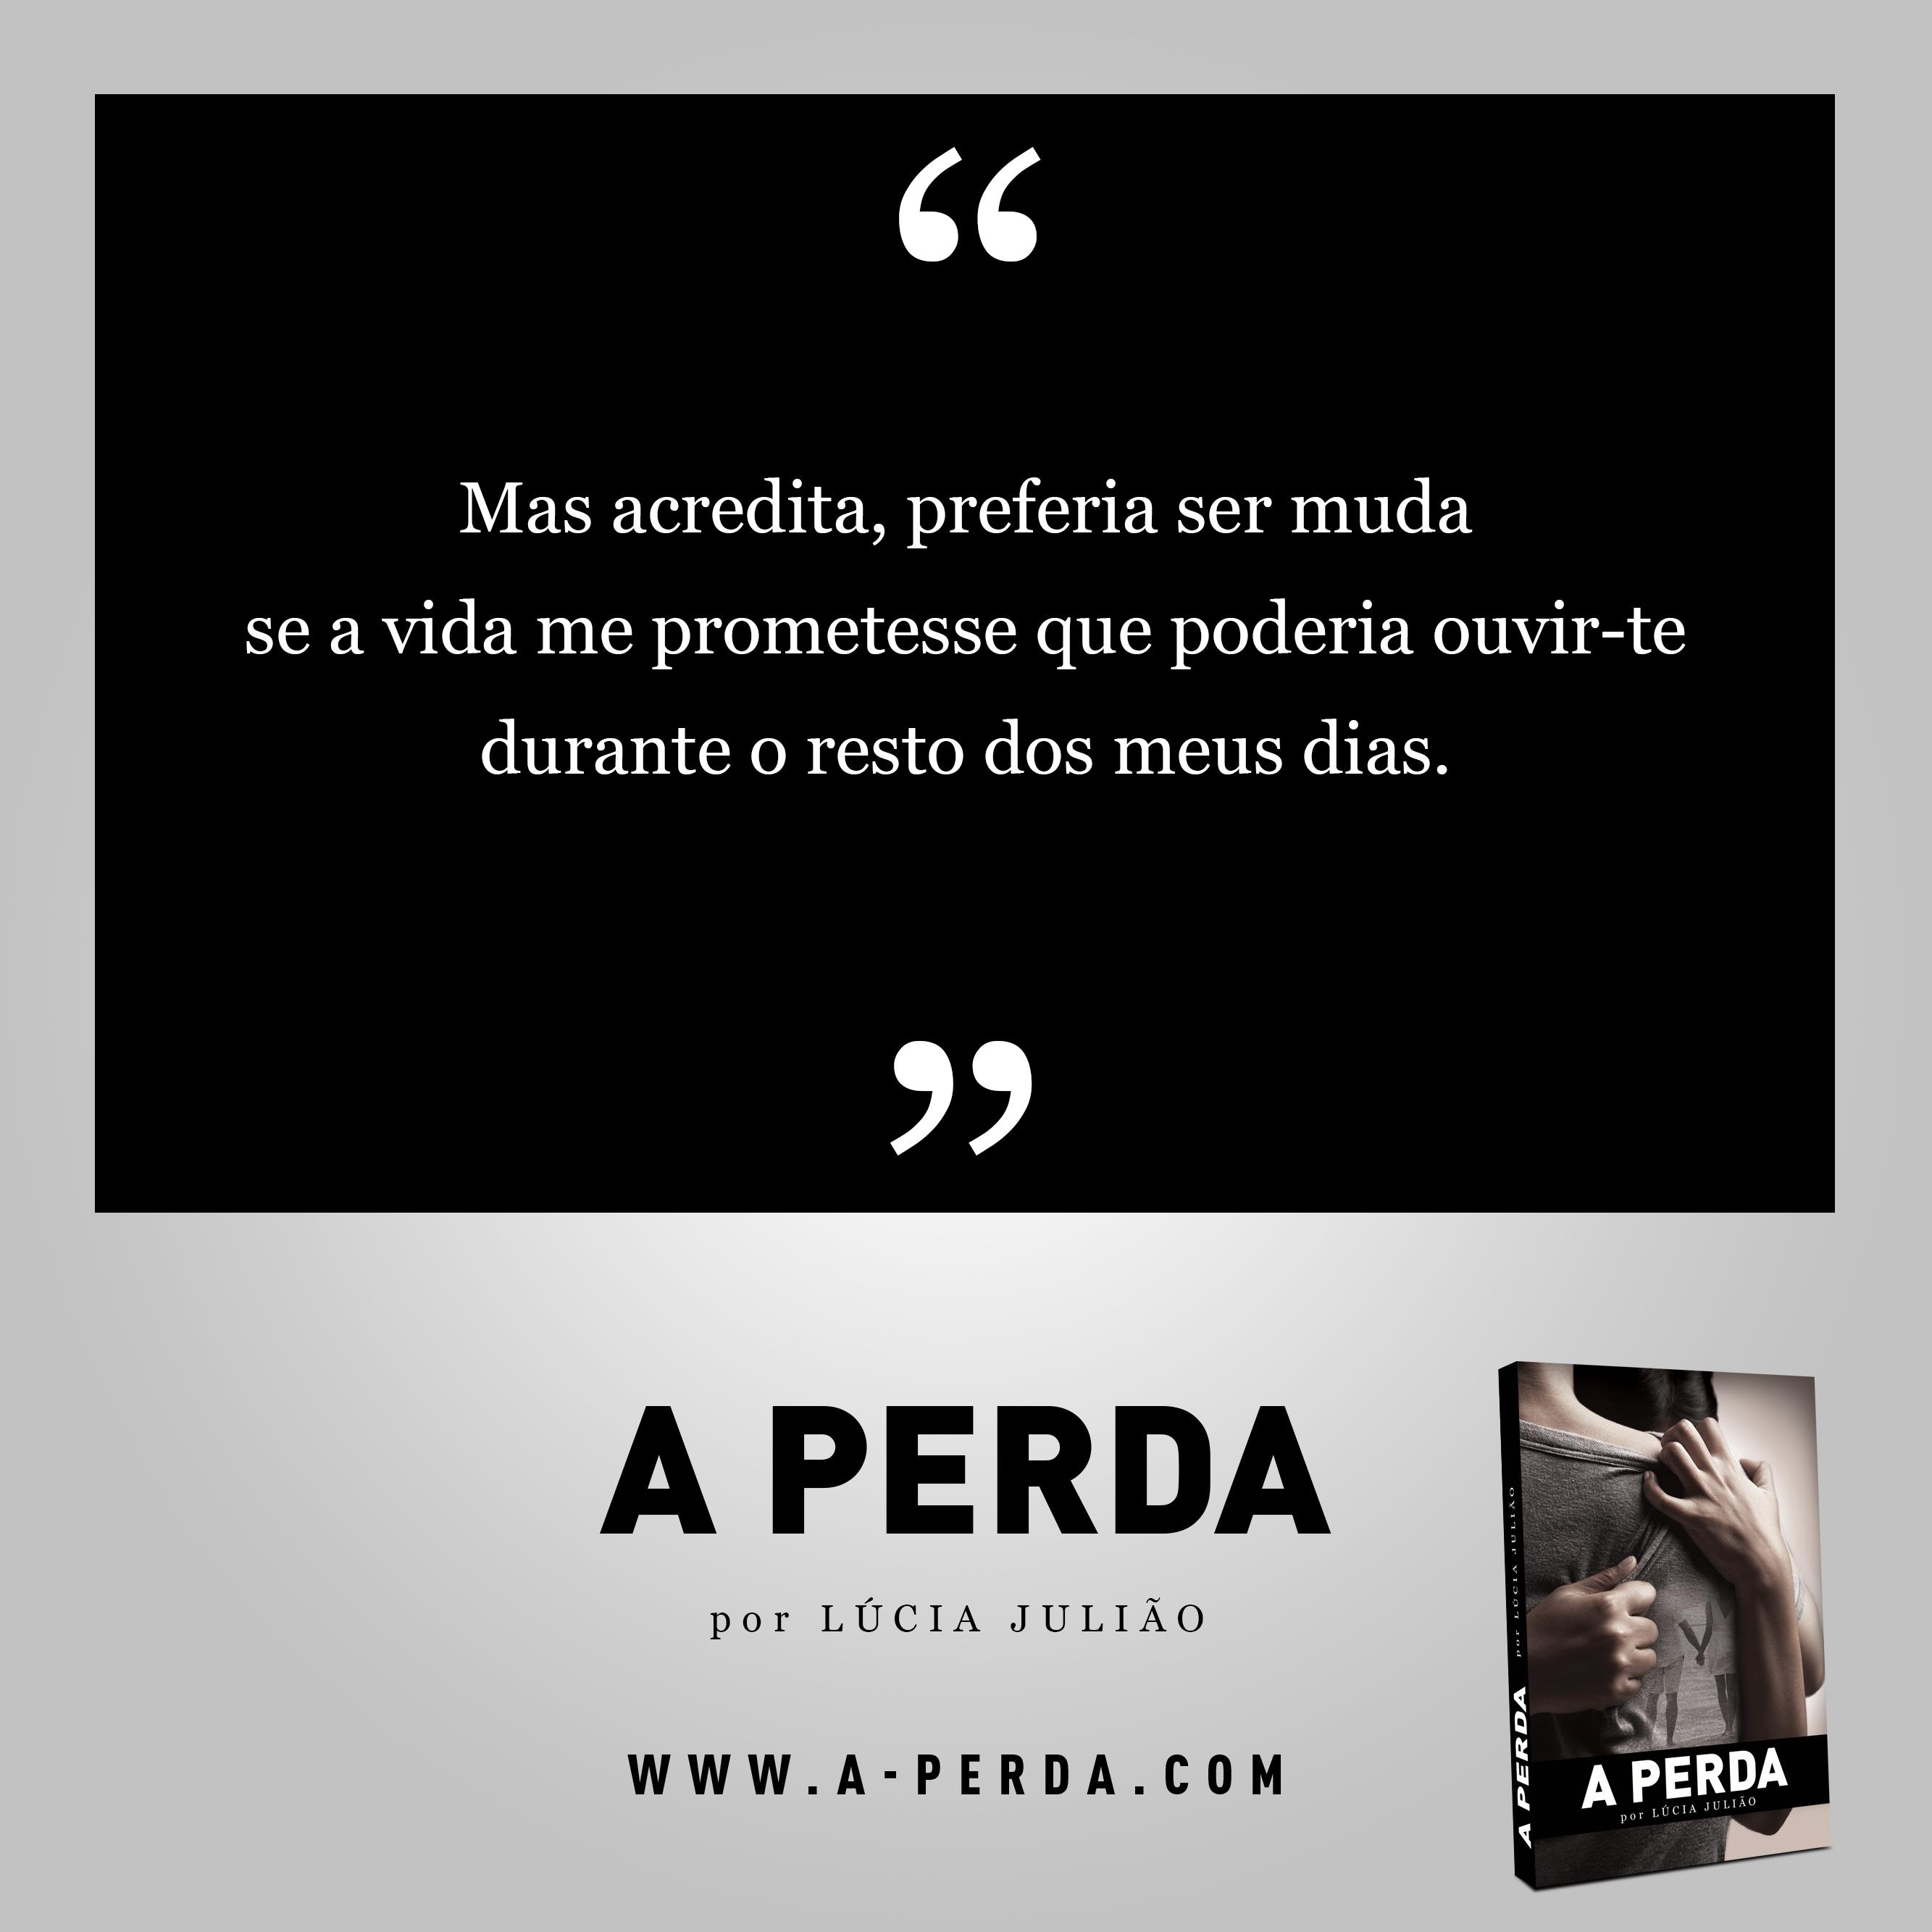 028-capitulo-14-livro-a-Perda-de-Lucia-Juliao-Instagram